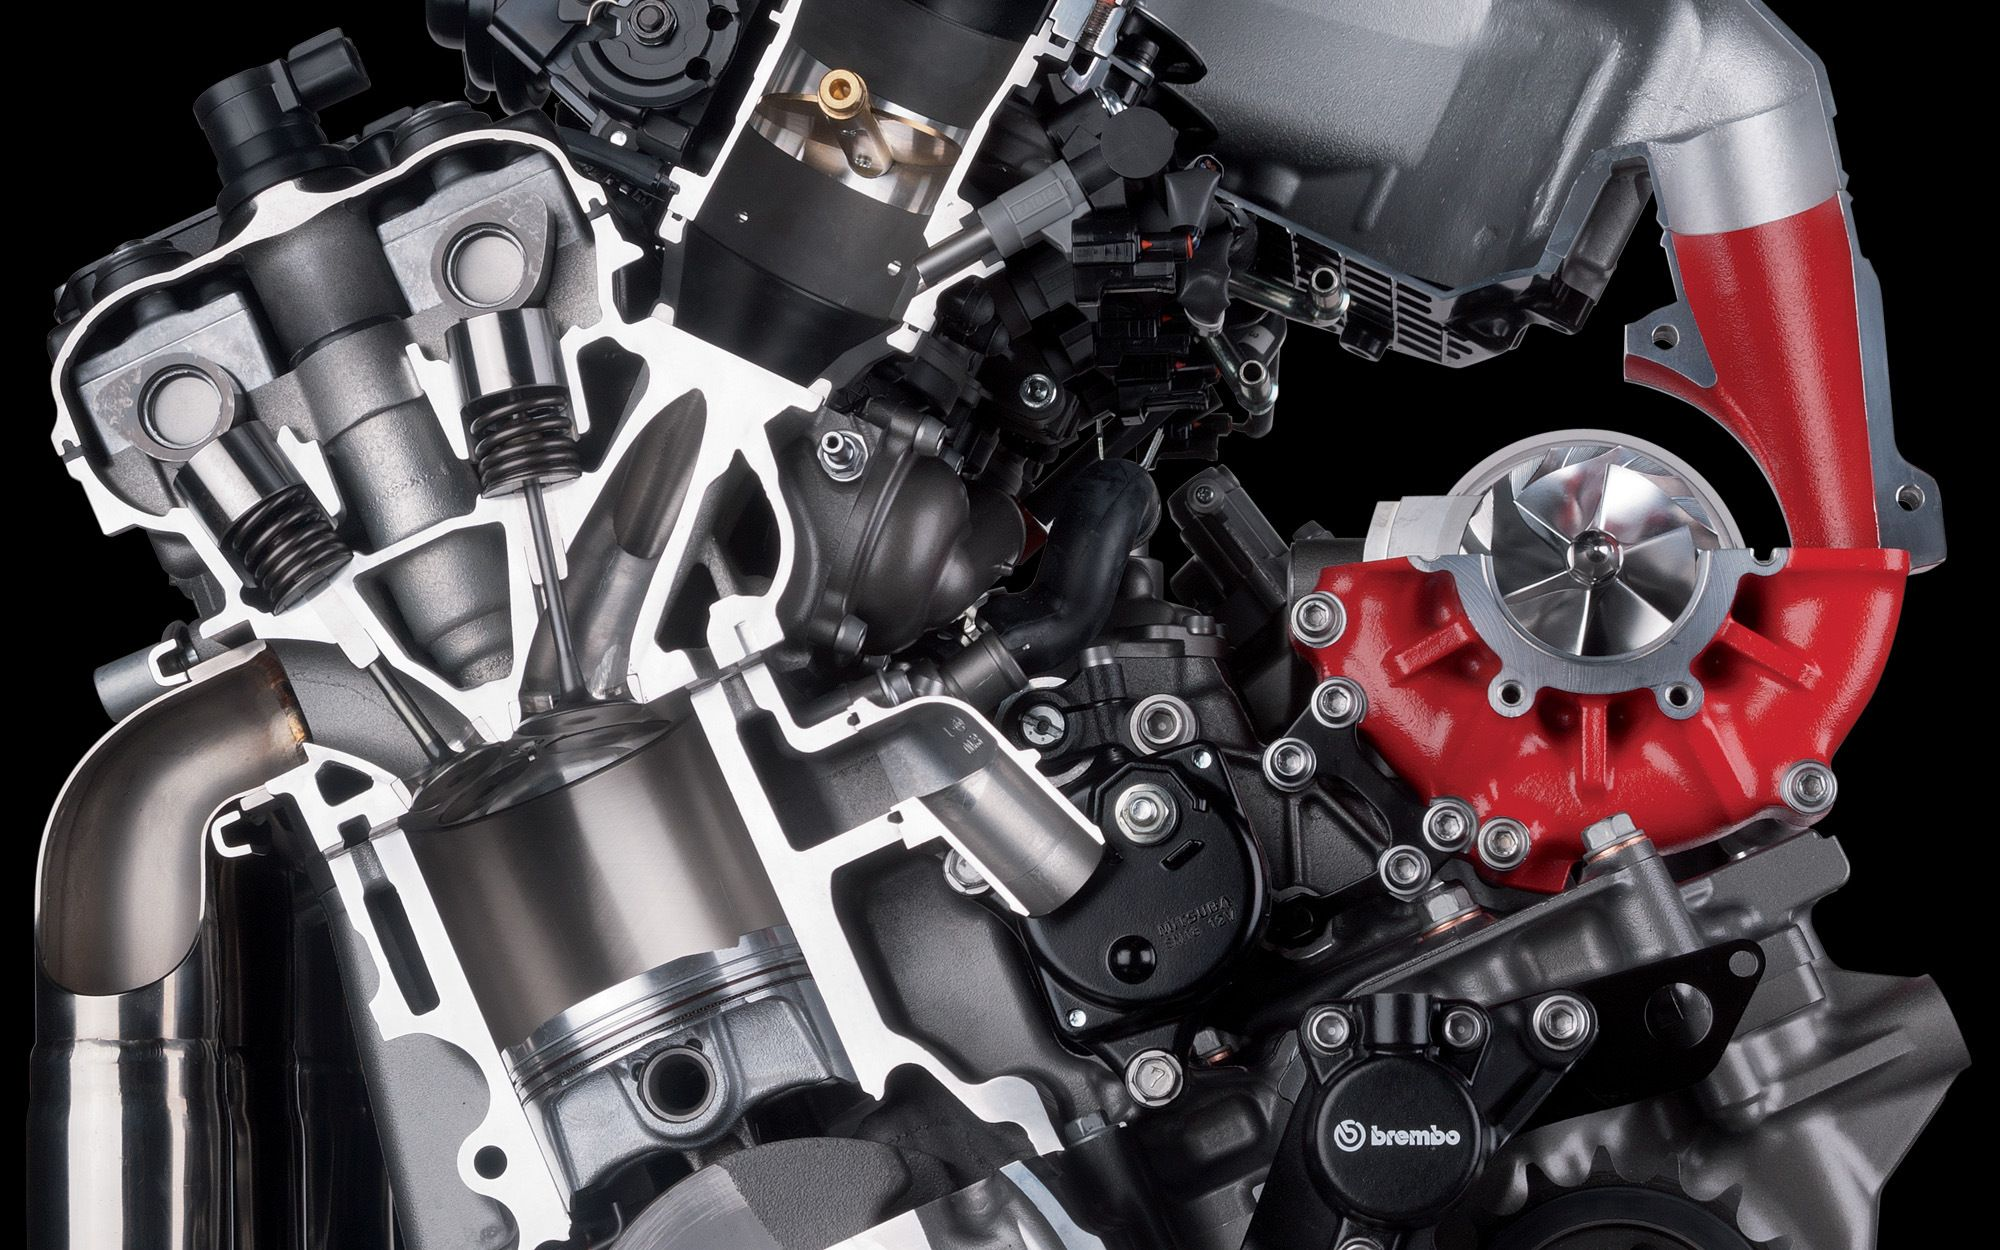 kawasaki h2 engine cutout. compressor. and a brembo part